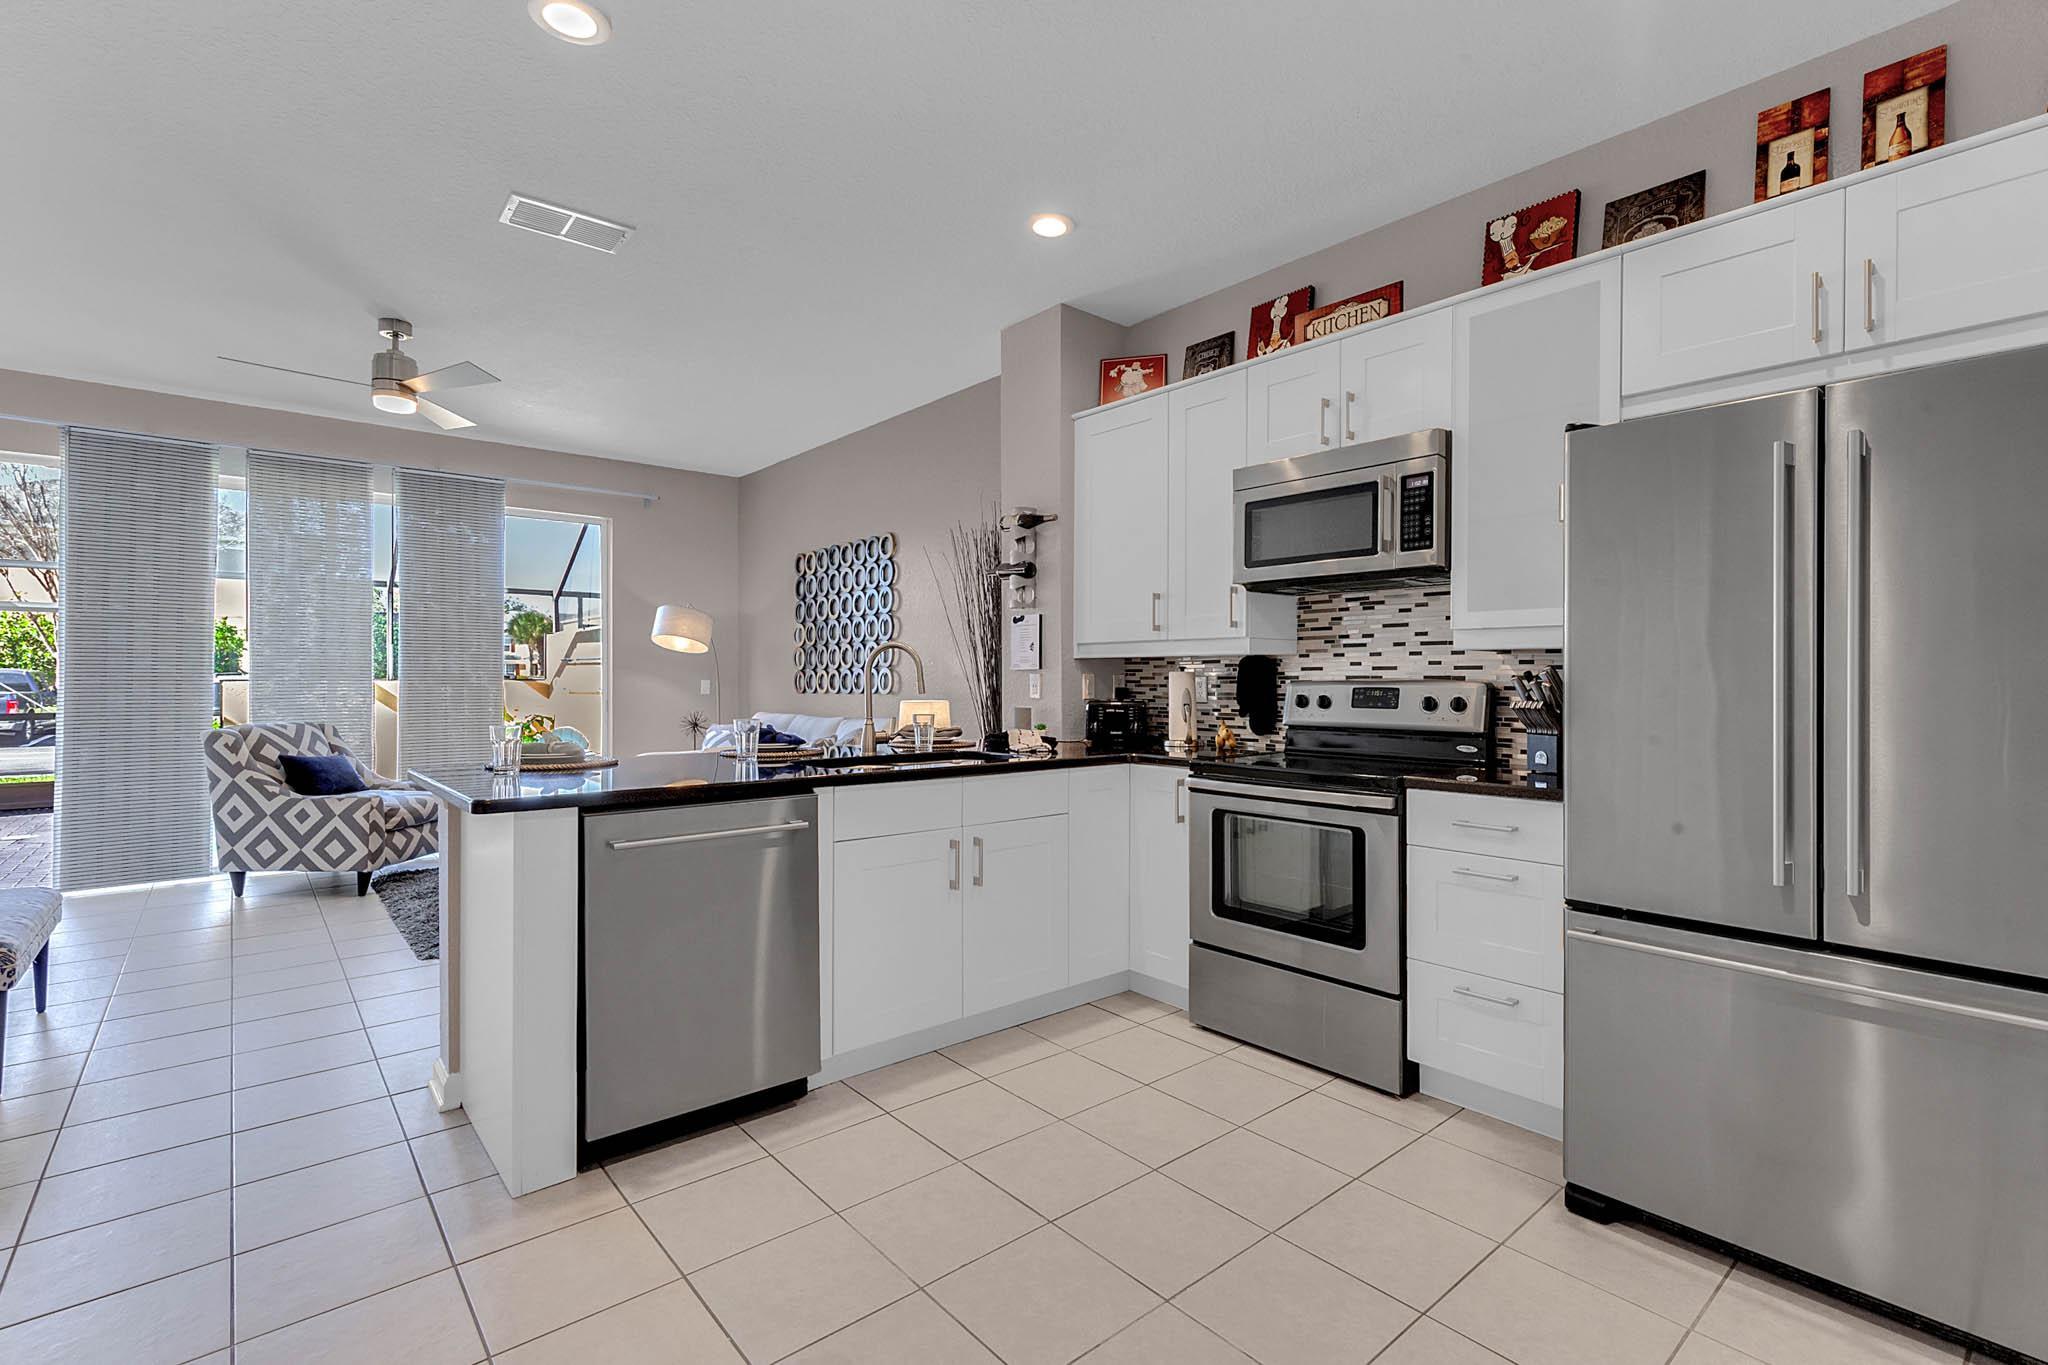 Stainless Appliances, Granite Countertops